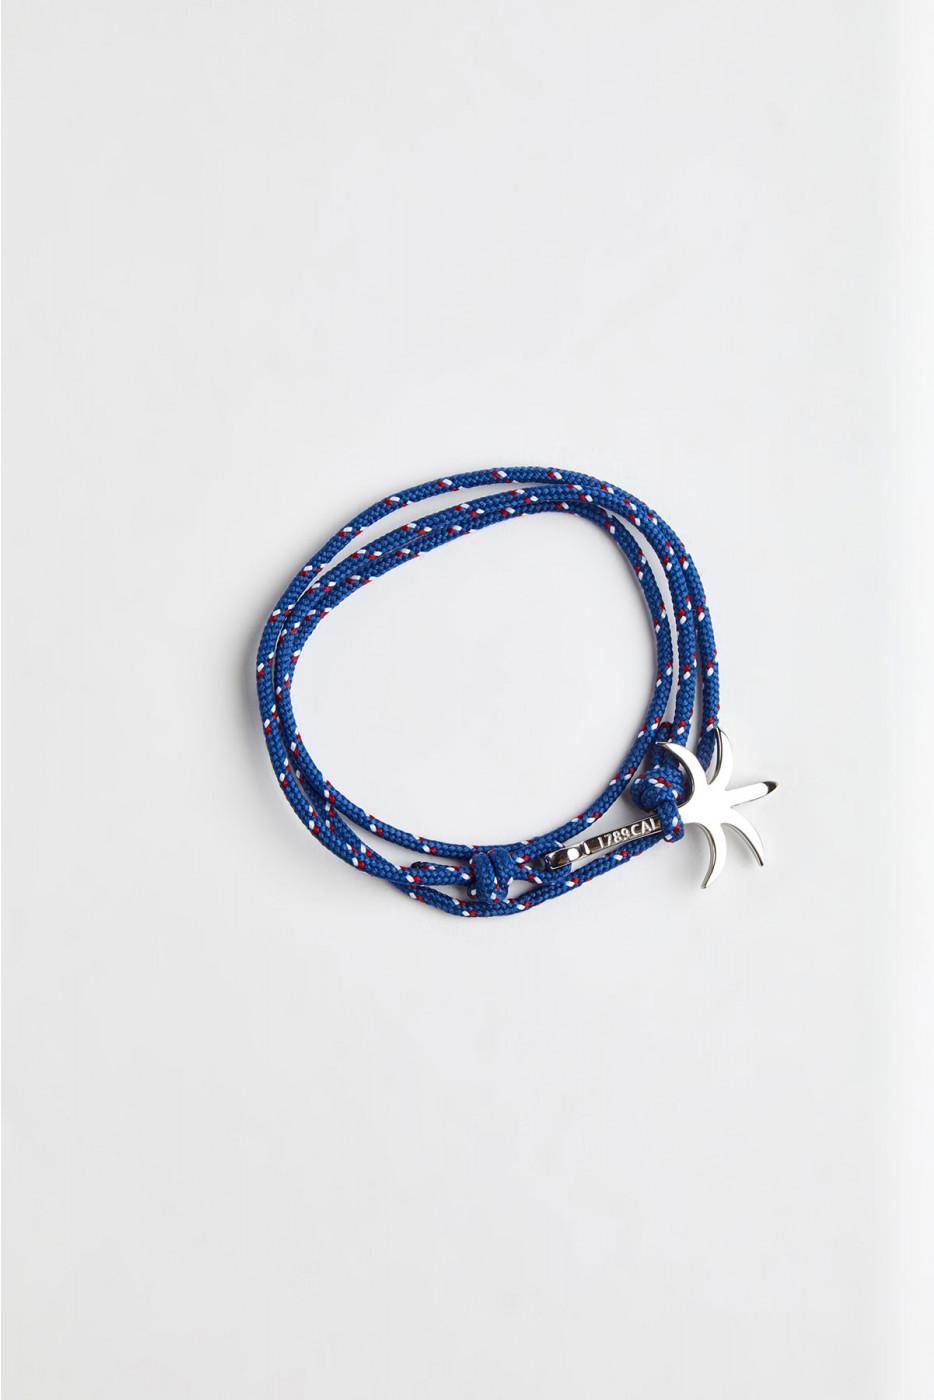 Bracelet Corde Indigo - PLAMIER BRACELET